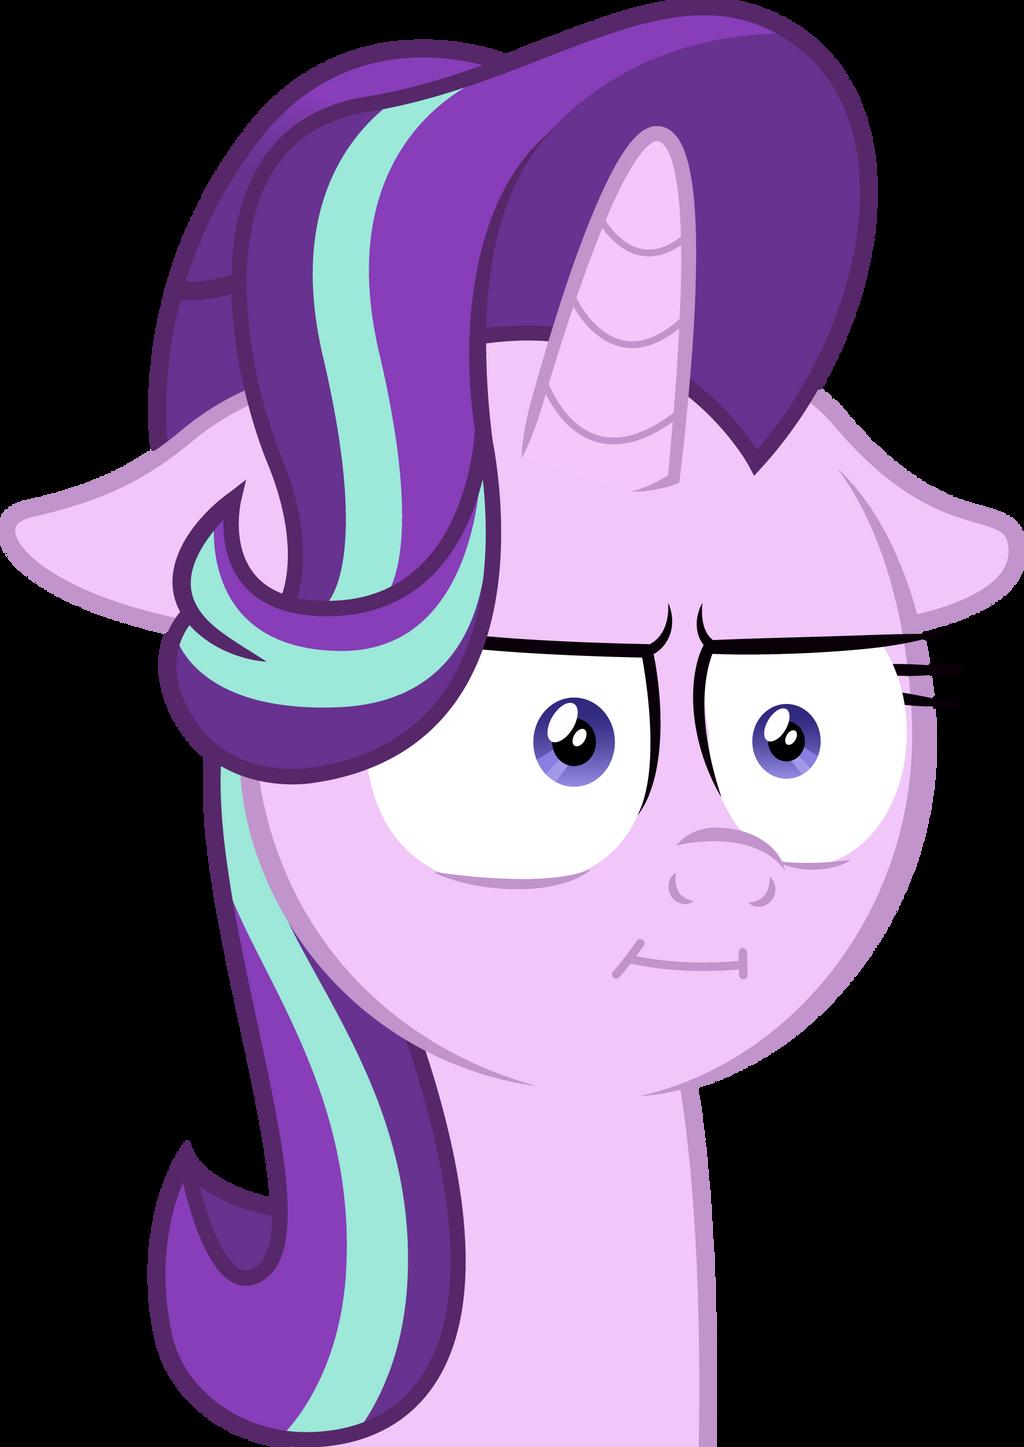 Starlight Glimmer - Oh. I see.